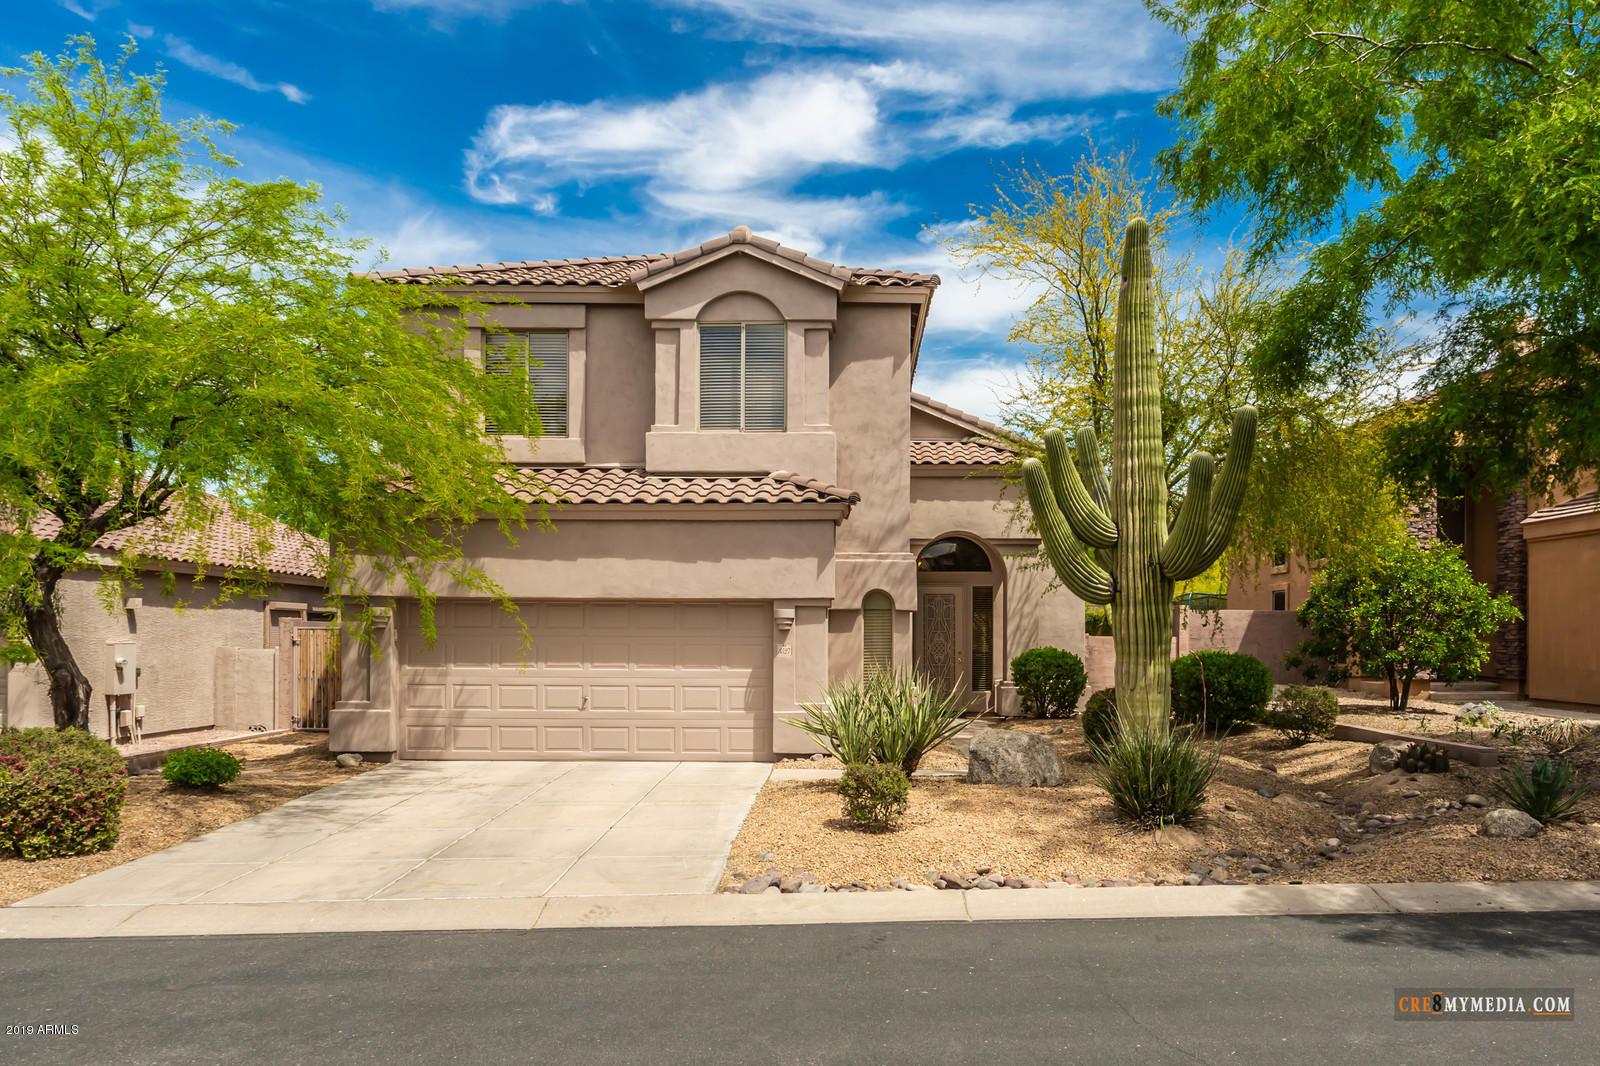 Photo of 3527 N DESERT OASIS --, Mesa, AZ 85207